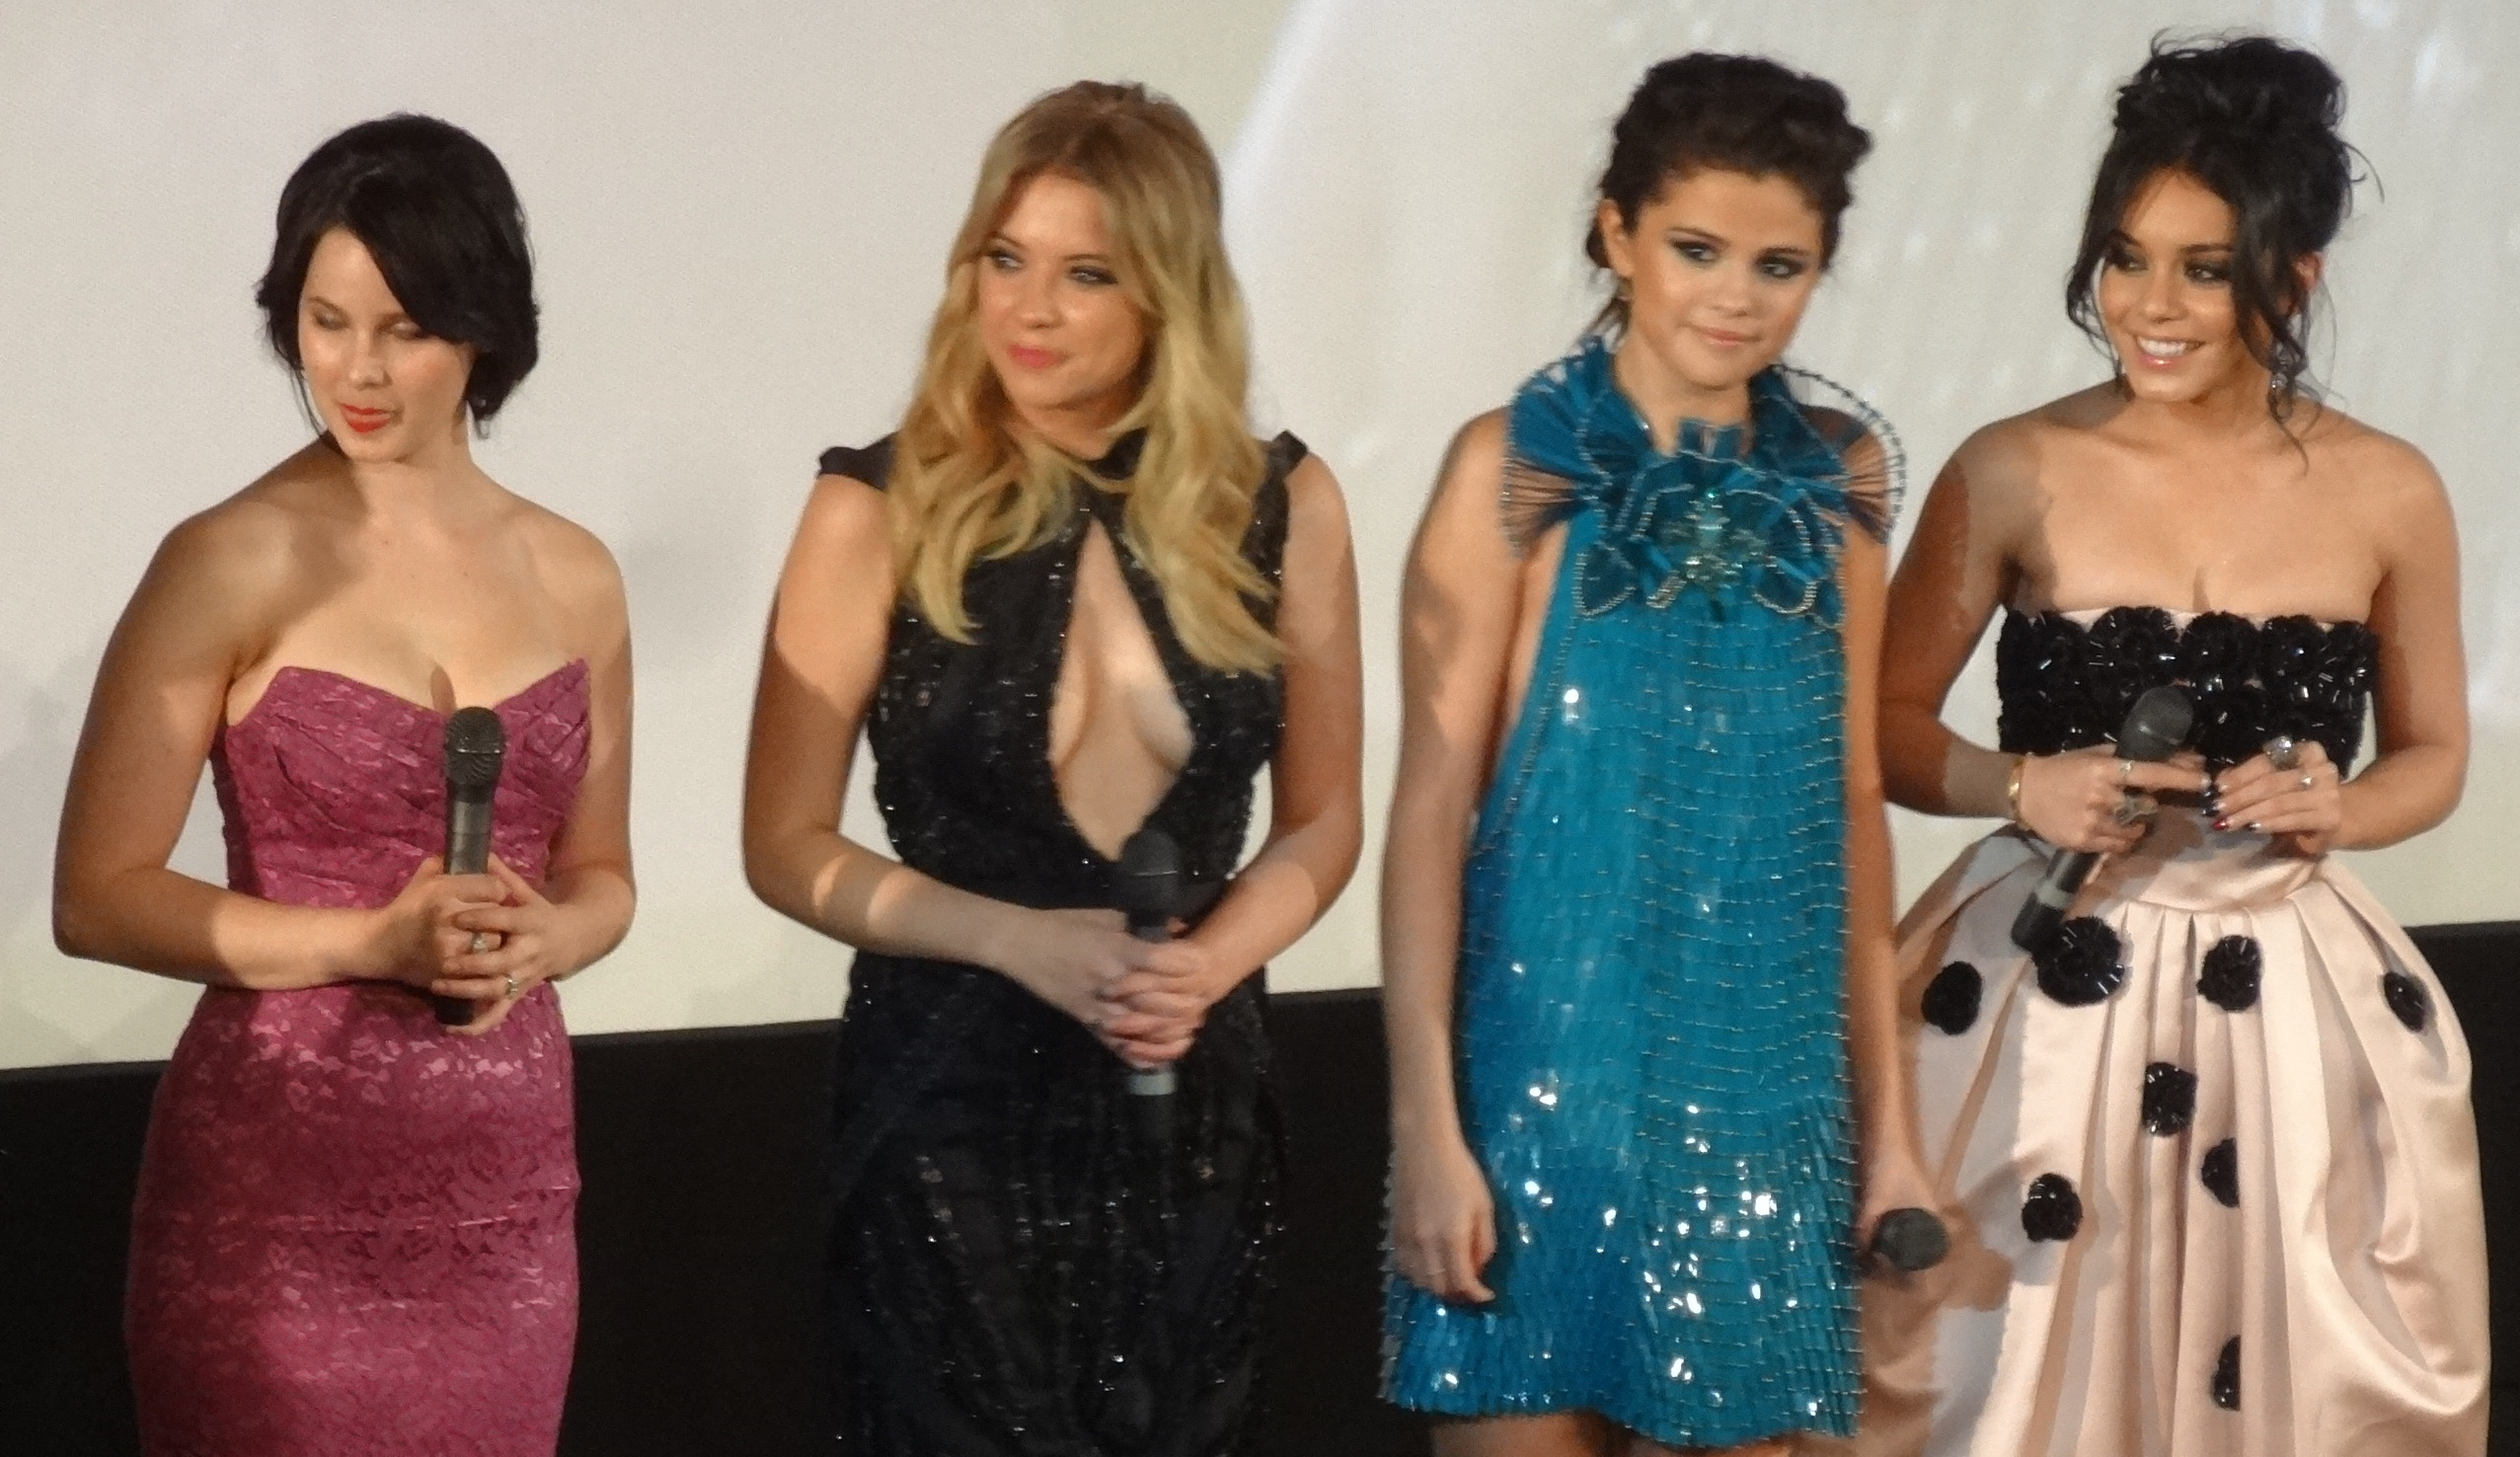 A part of the main cast at the film's premiere in Paris in February 2013: Rachel Korine, Ashley Benson, Selena Gomez and Vanessa Hudgens